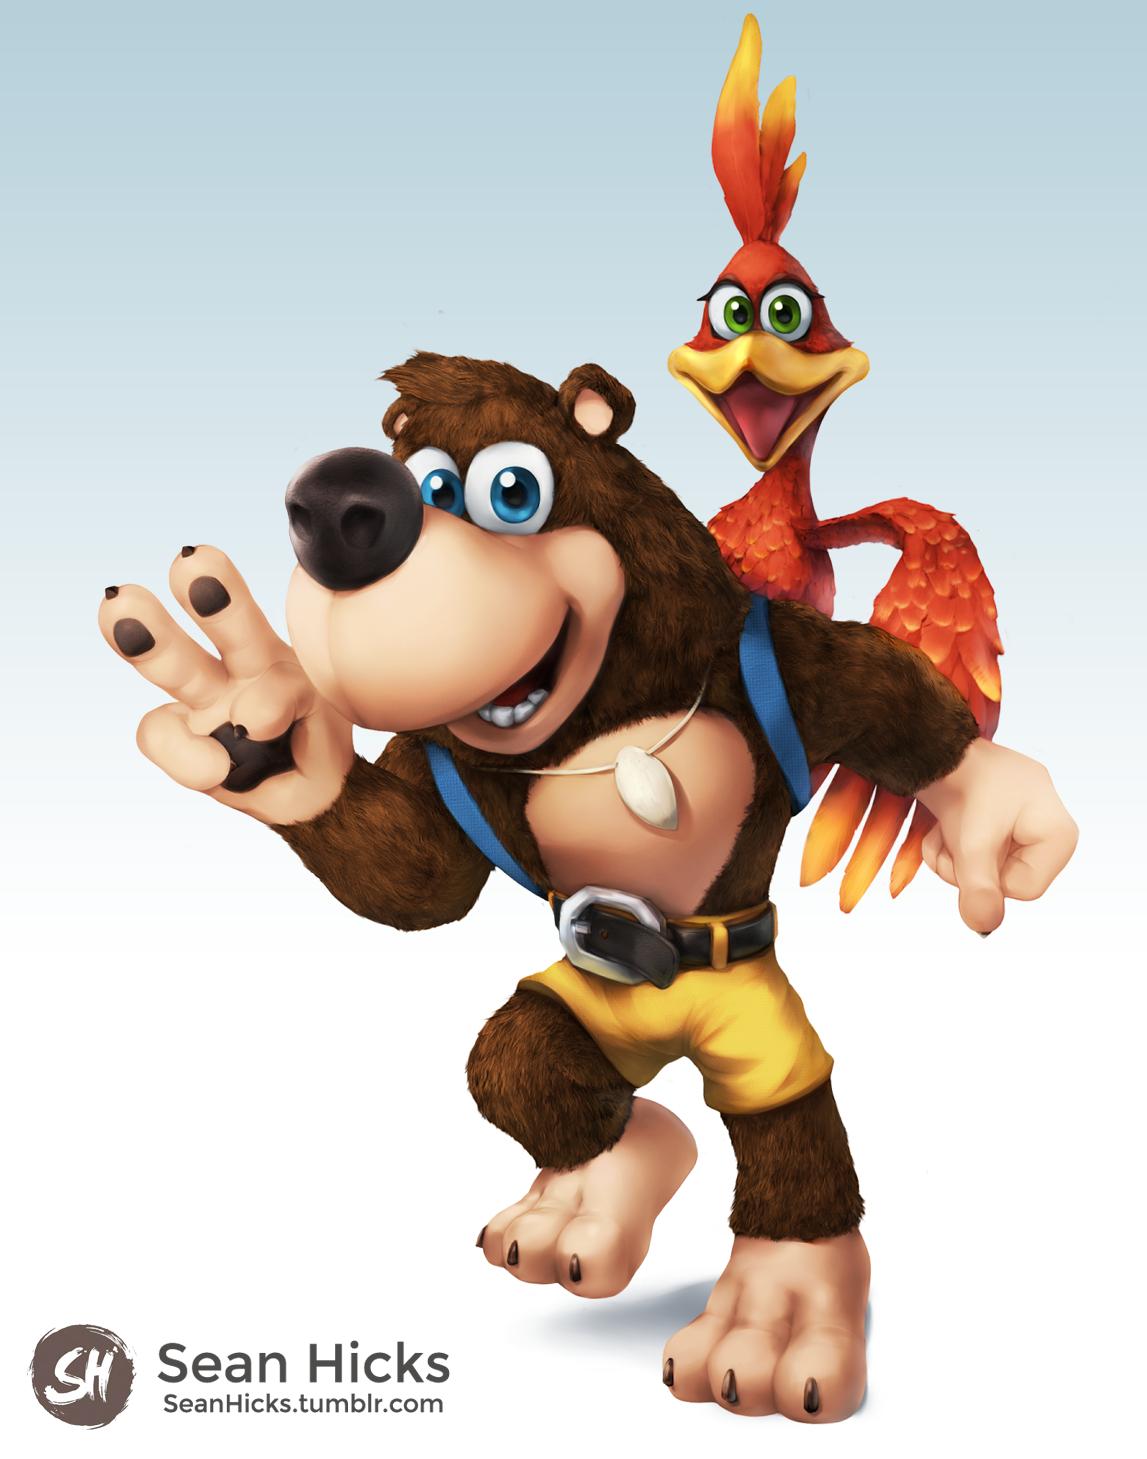 Banjo Kazooie Ssb4 Like Render Super Smash Brothers Banjo Kazooie Banjo Nintendo Super Smash Bros